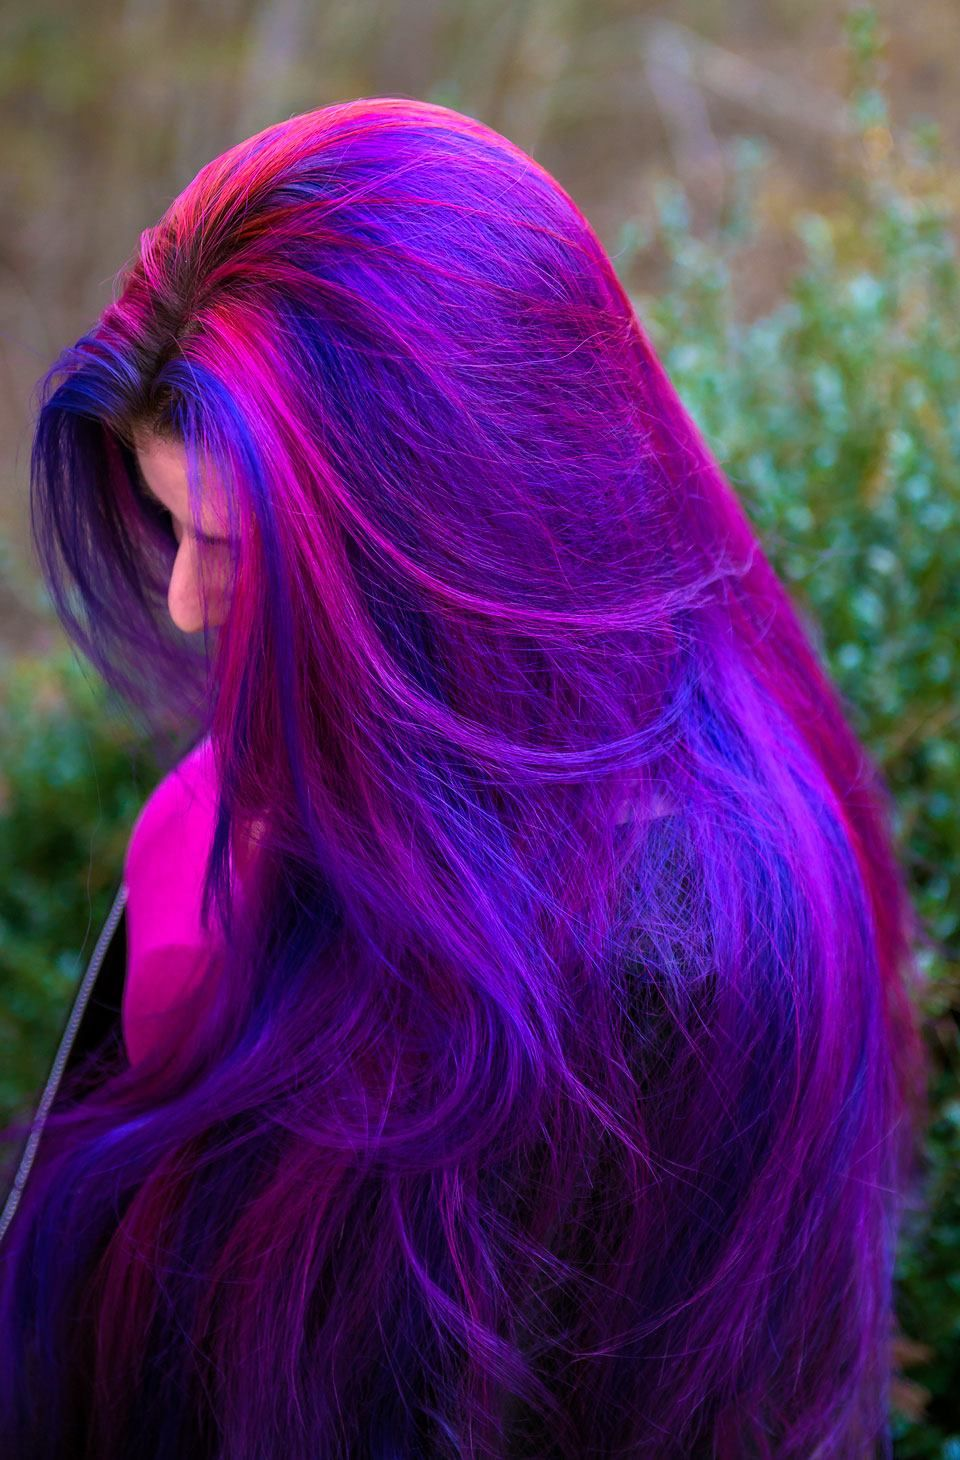 Stunning Color Lizzie Davis On Facebook Hair Color